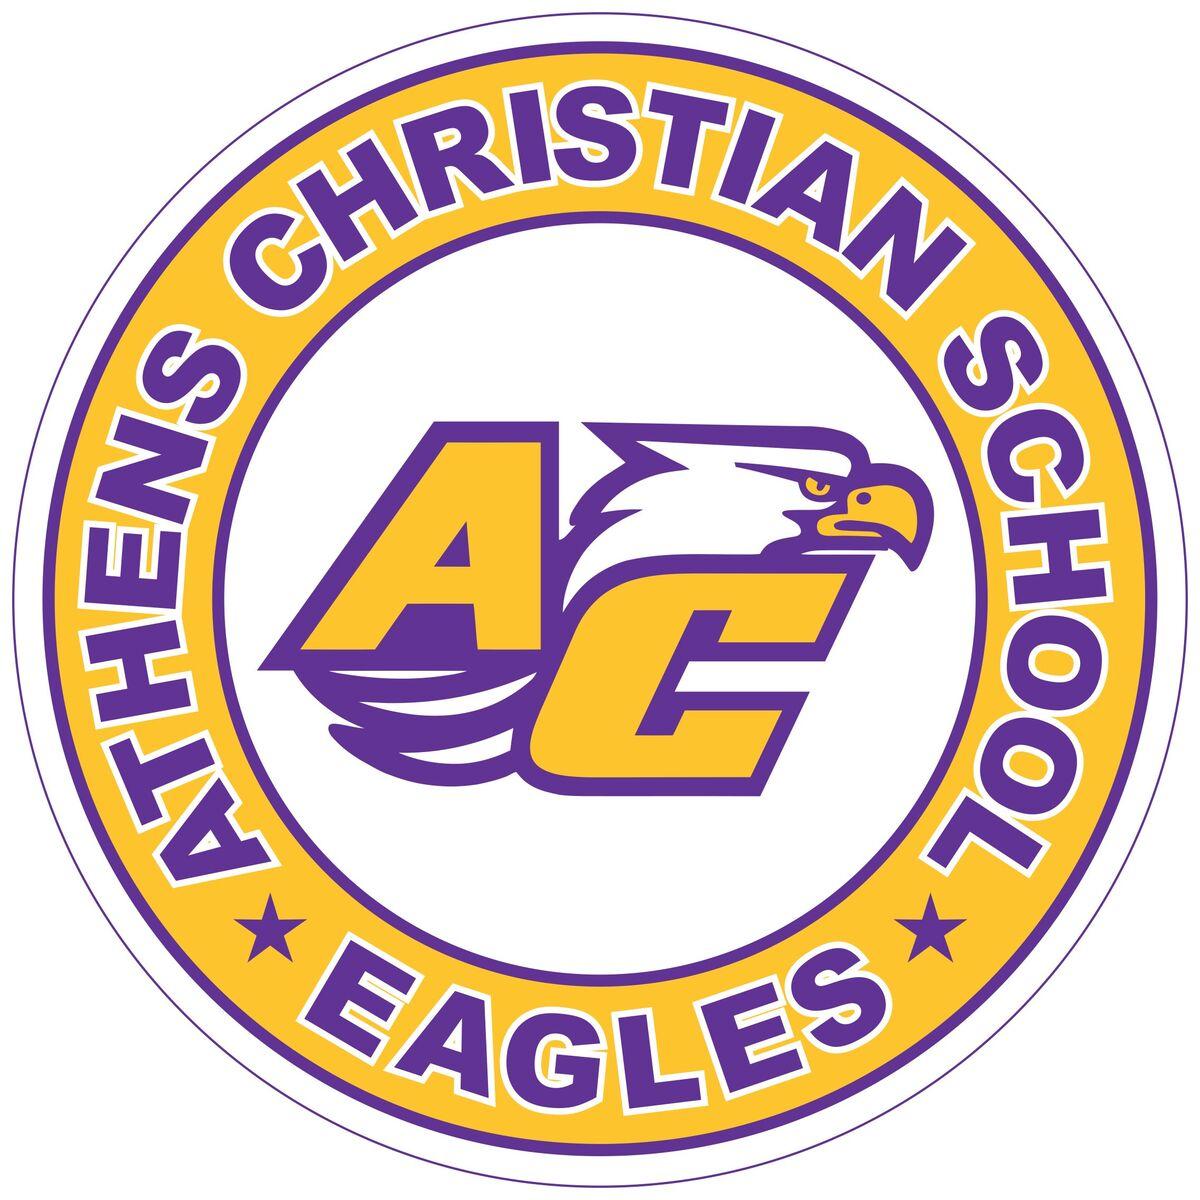 Private Schools In Ga: FaithTalk Atlanta 970 - Atlanta, GA